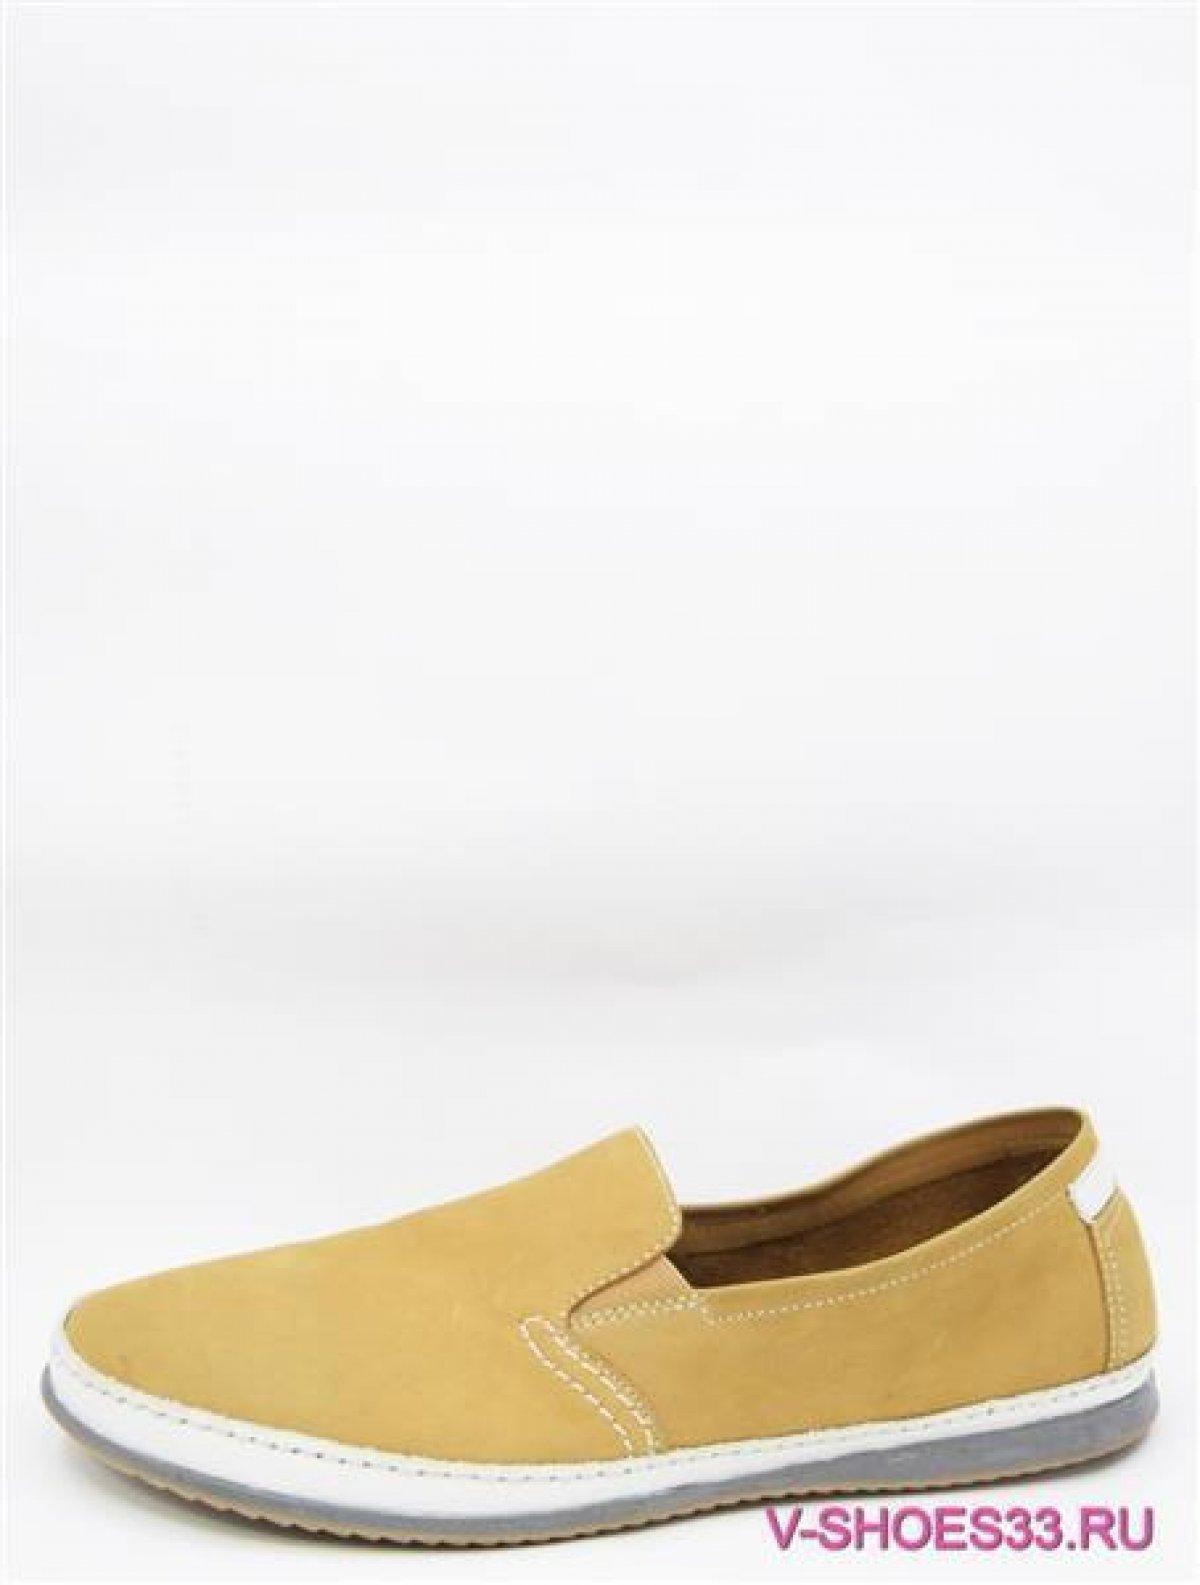 K83-075675 мужские туфли